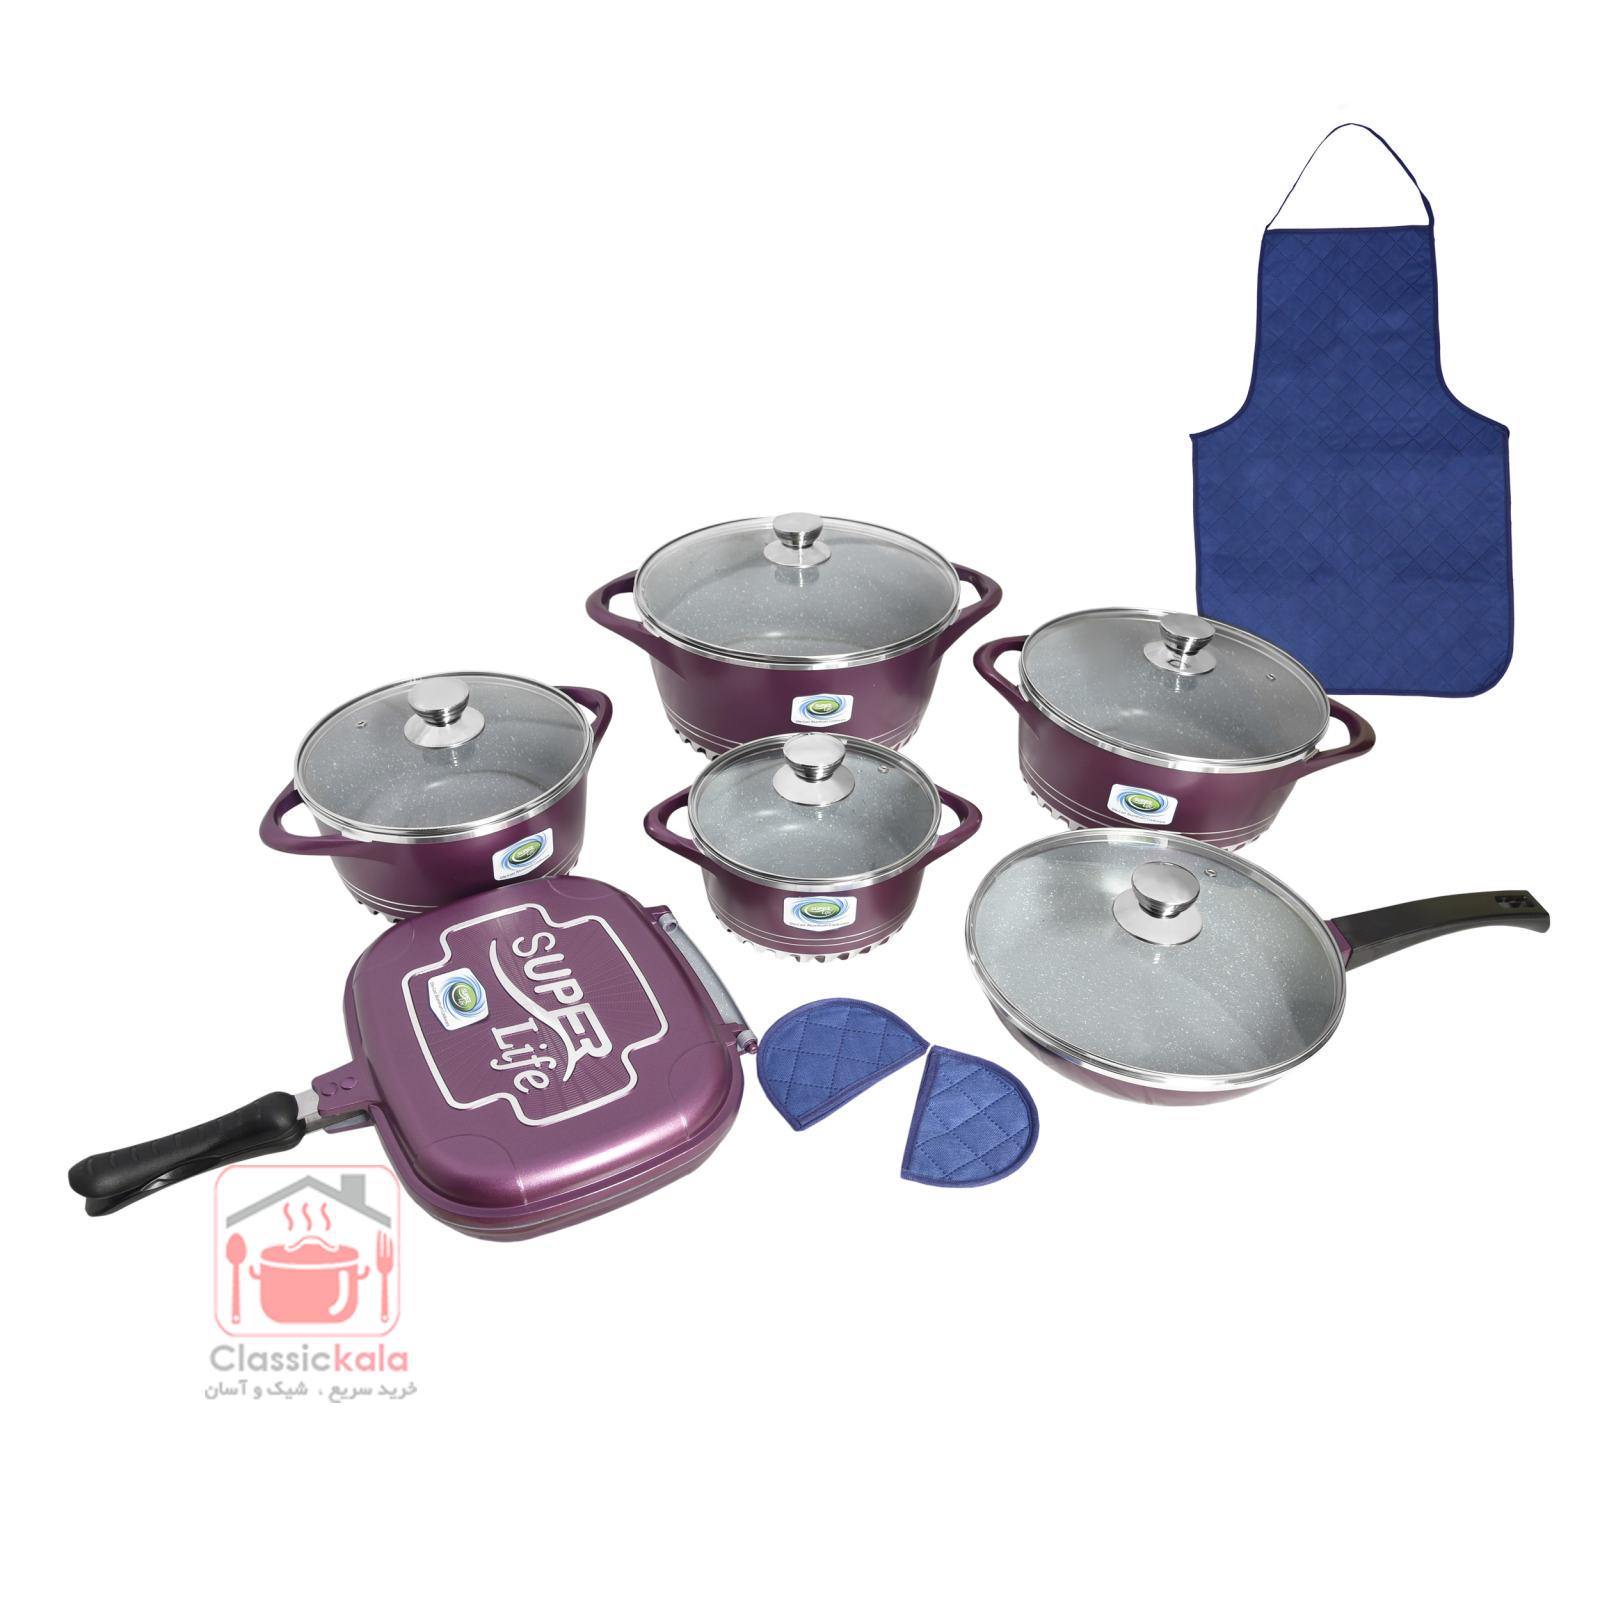 سرویس پخت و پز ۱۵ پارچه سوپرلایف مدل رینگی